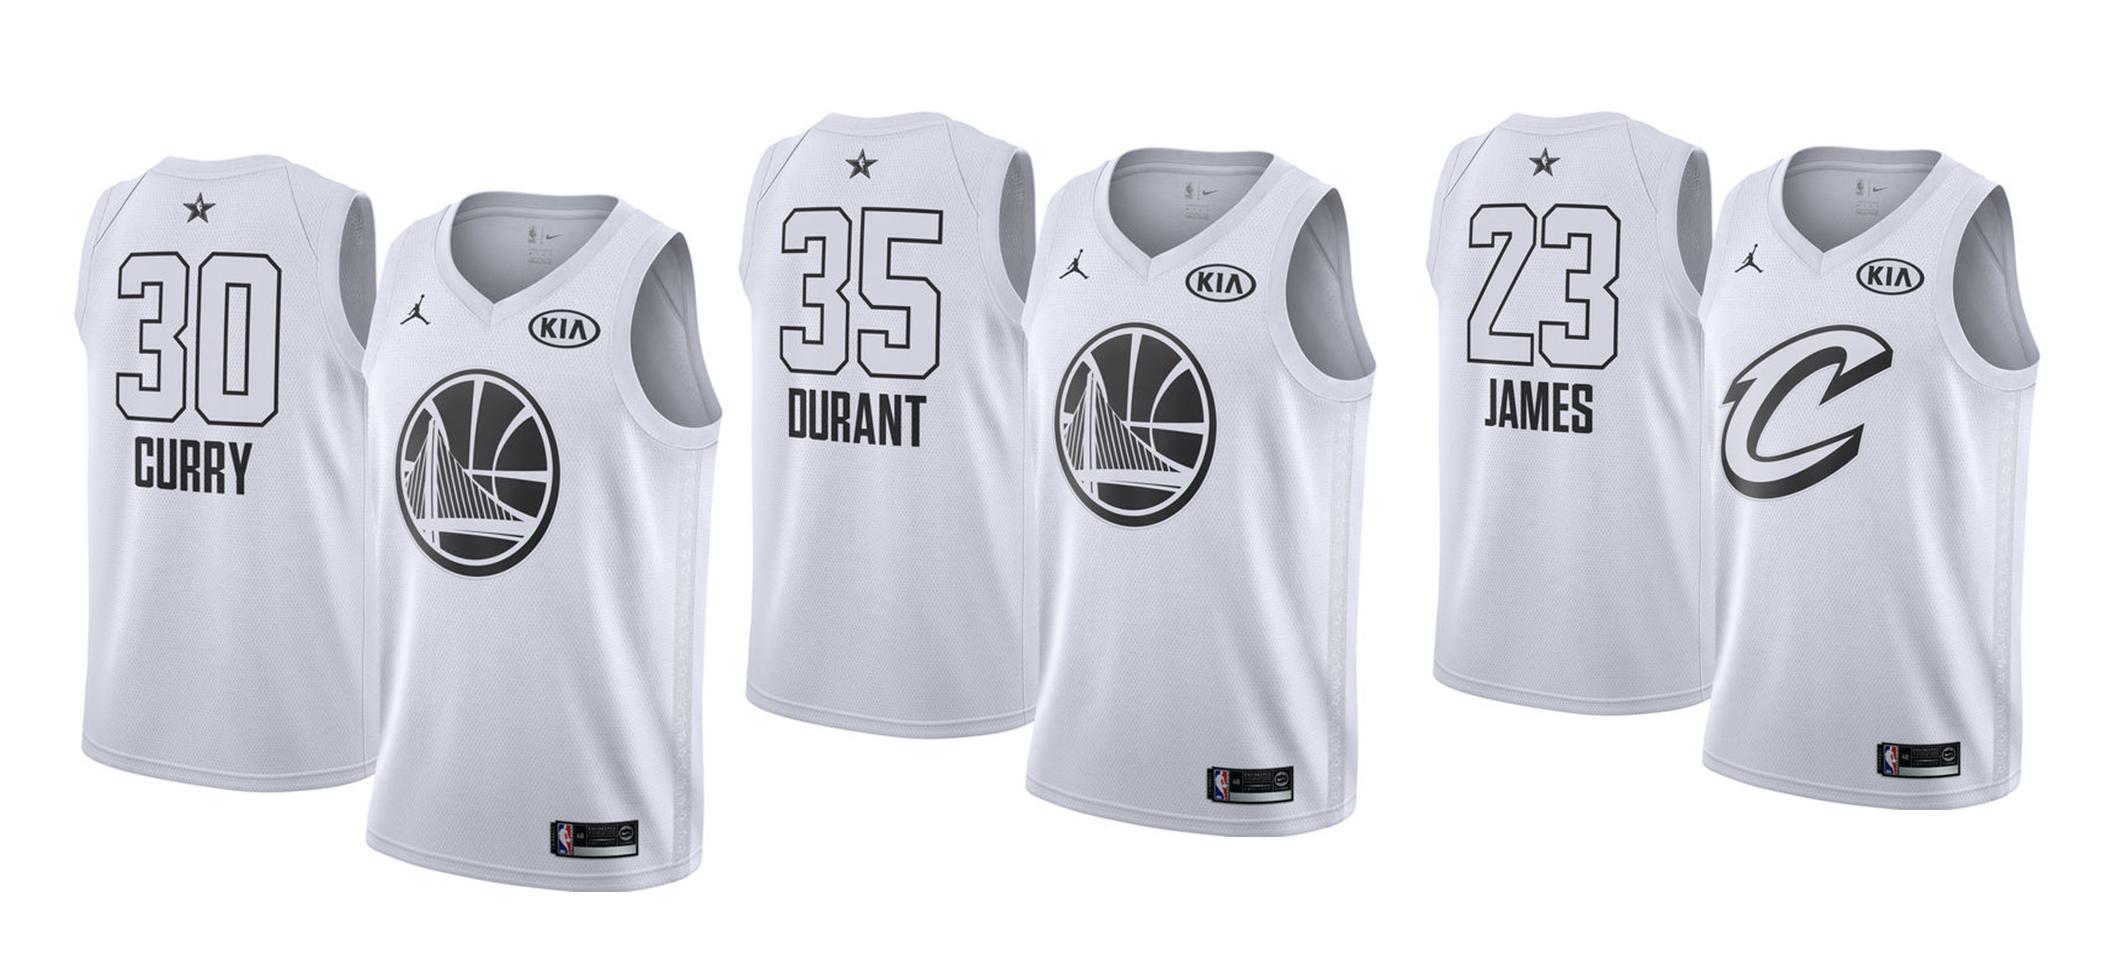 pretty nice 28583 721d5 Get a good look at the 2018 Jordan Brand NBA All-Star ...